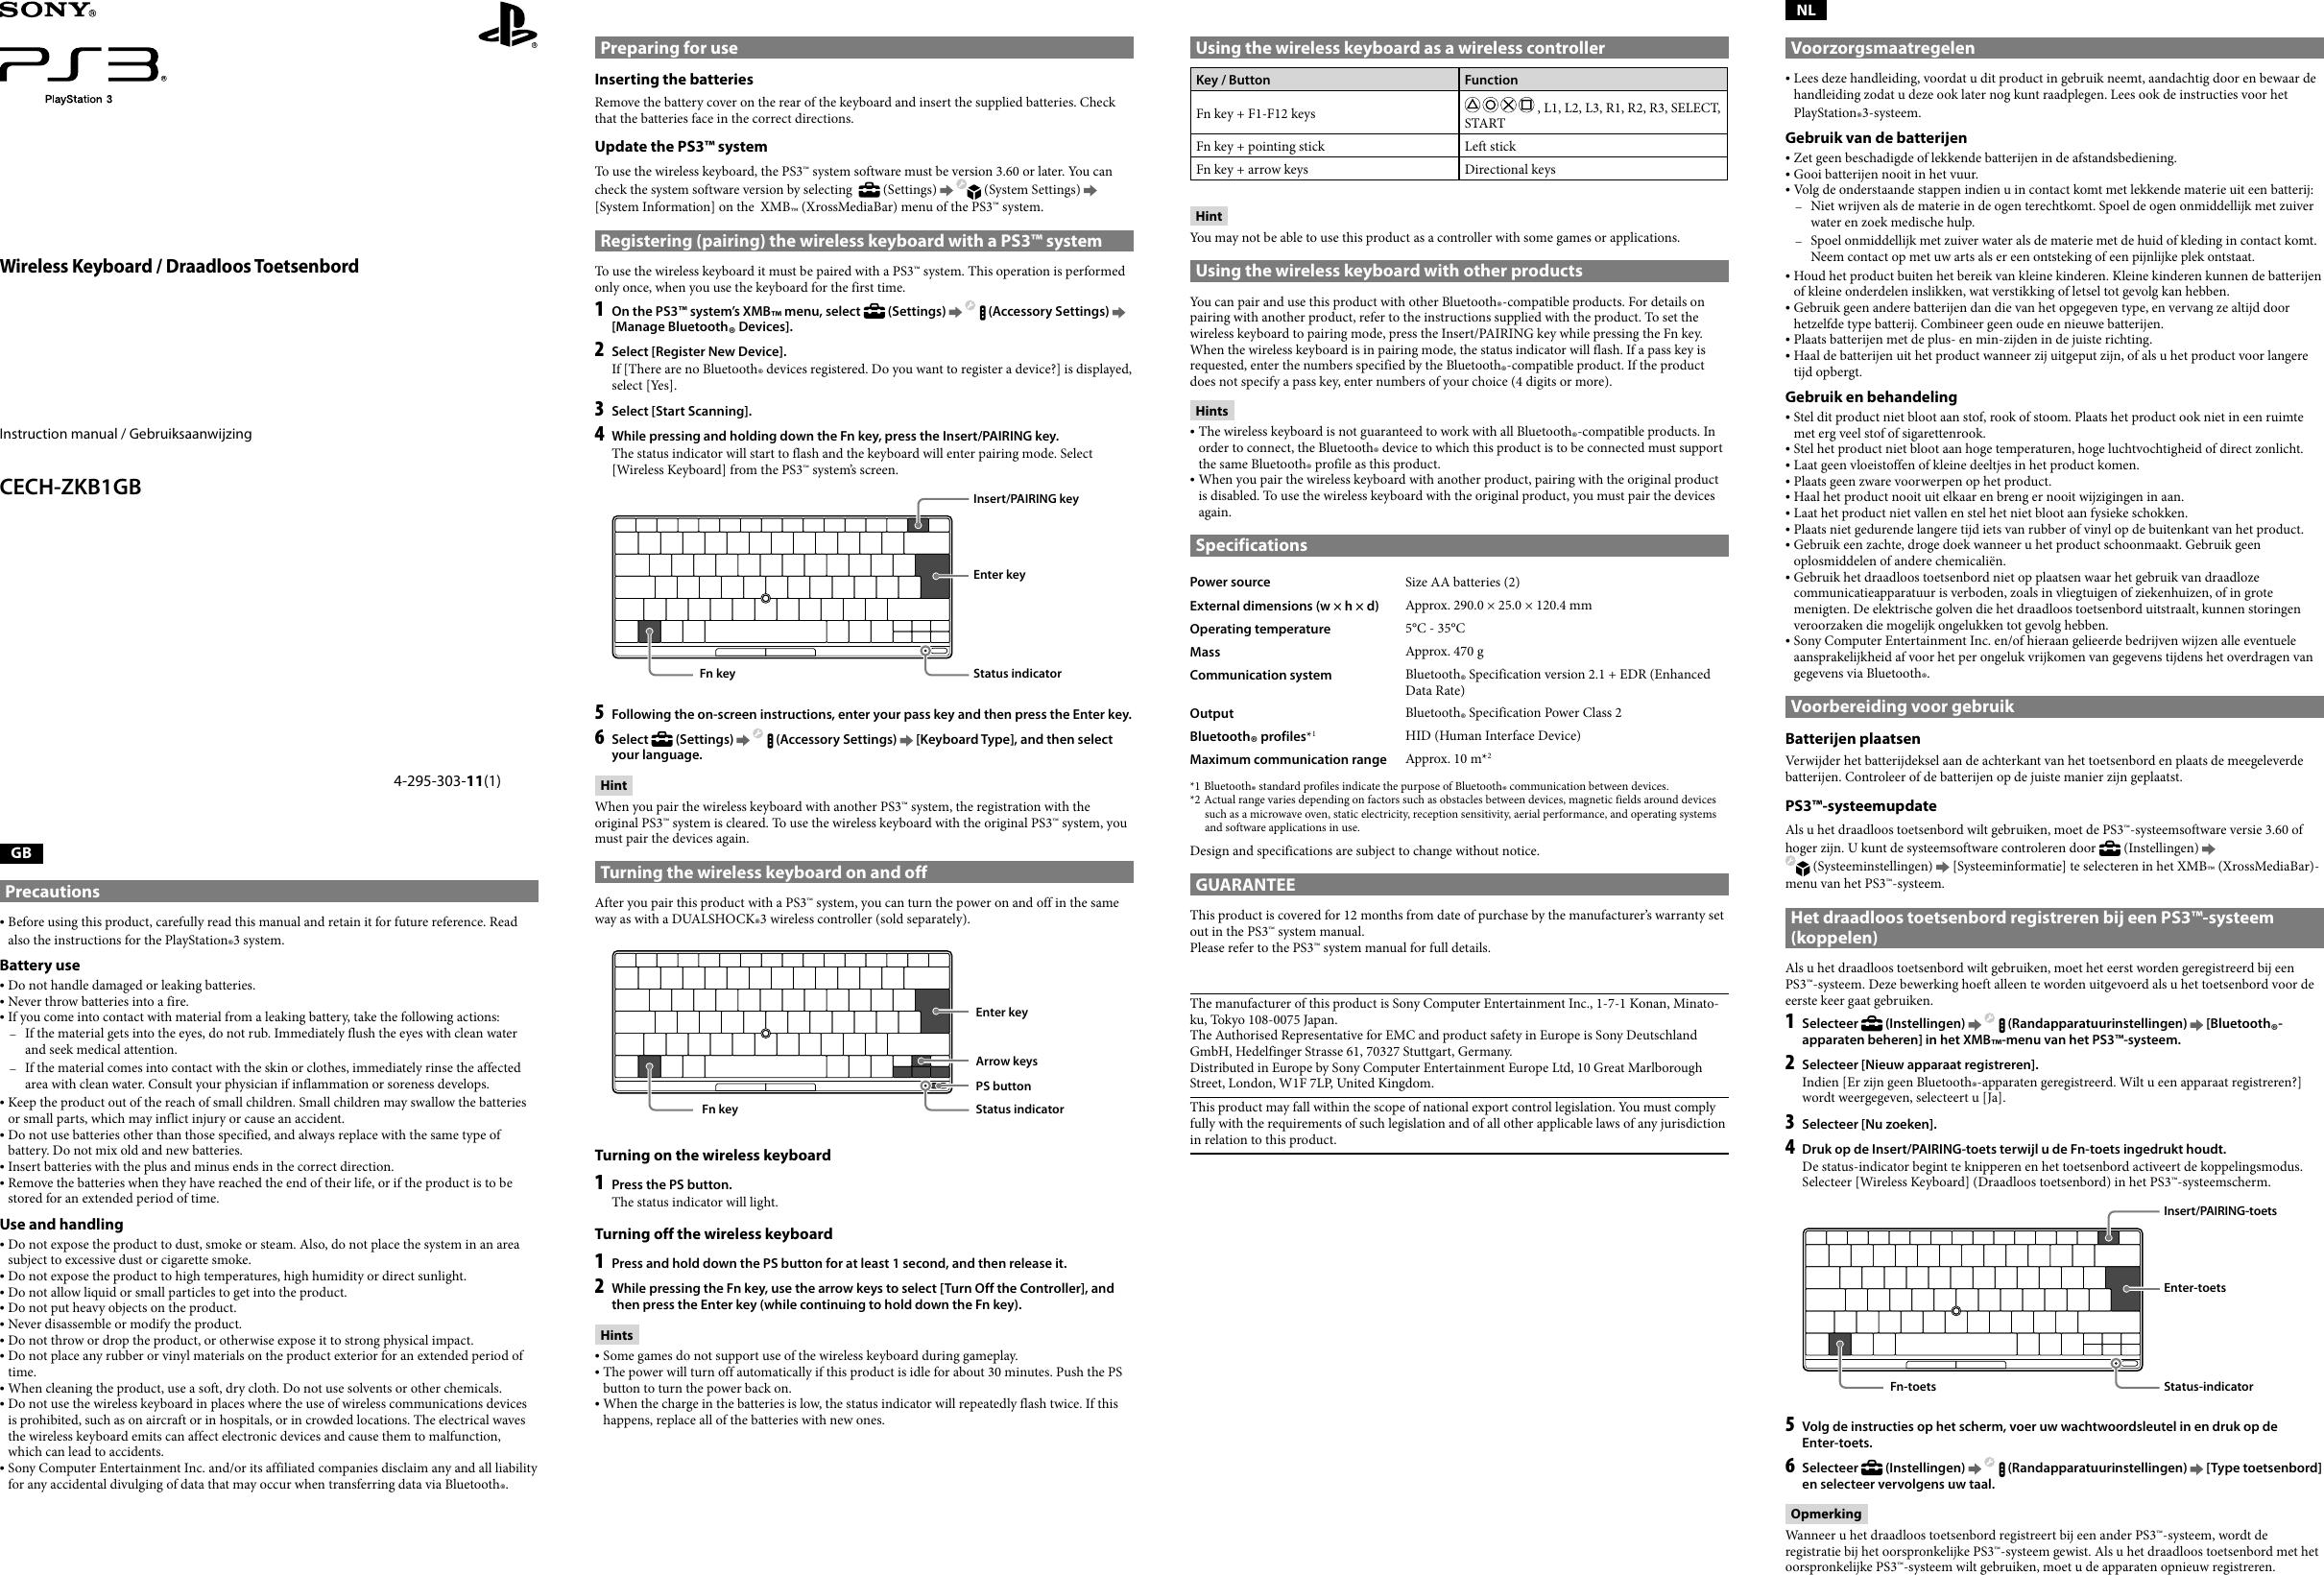 Sony Manual Ps3 Diagram Of Honda Generator Parts Ex800 A Jpn Vin G100 Array Wireless Keyboard Cech Zkb1gb Operating Instructions Rh Usermanual Wiki